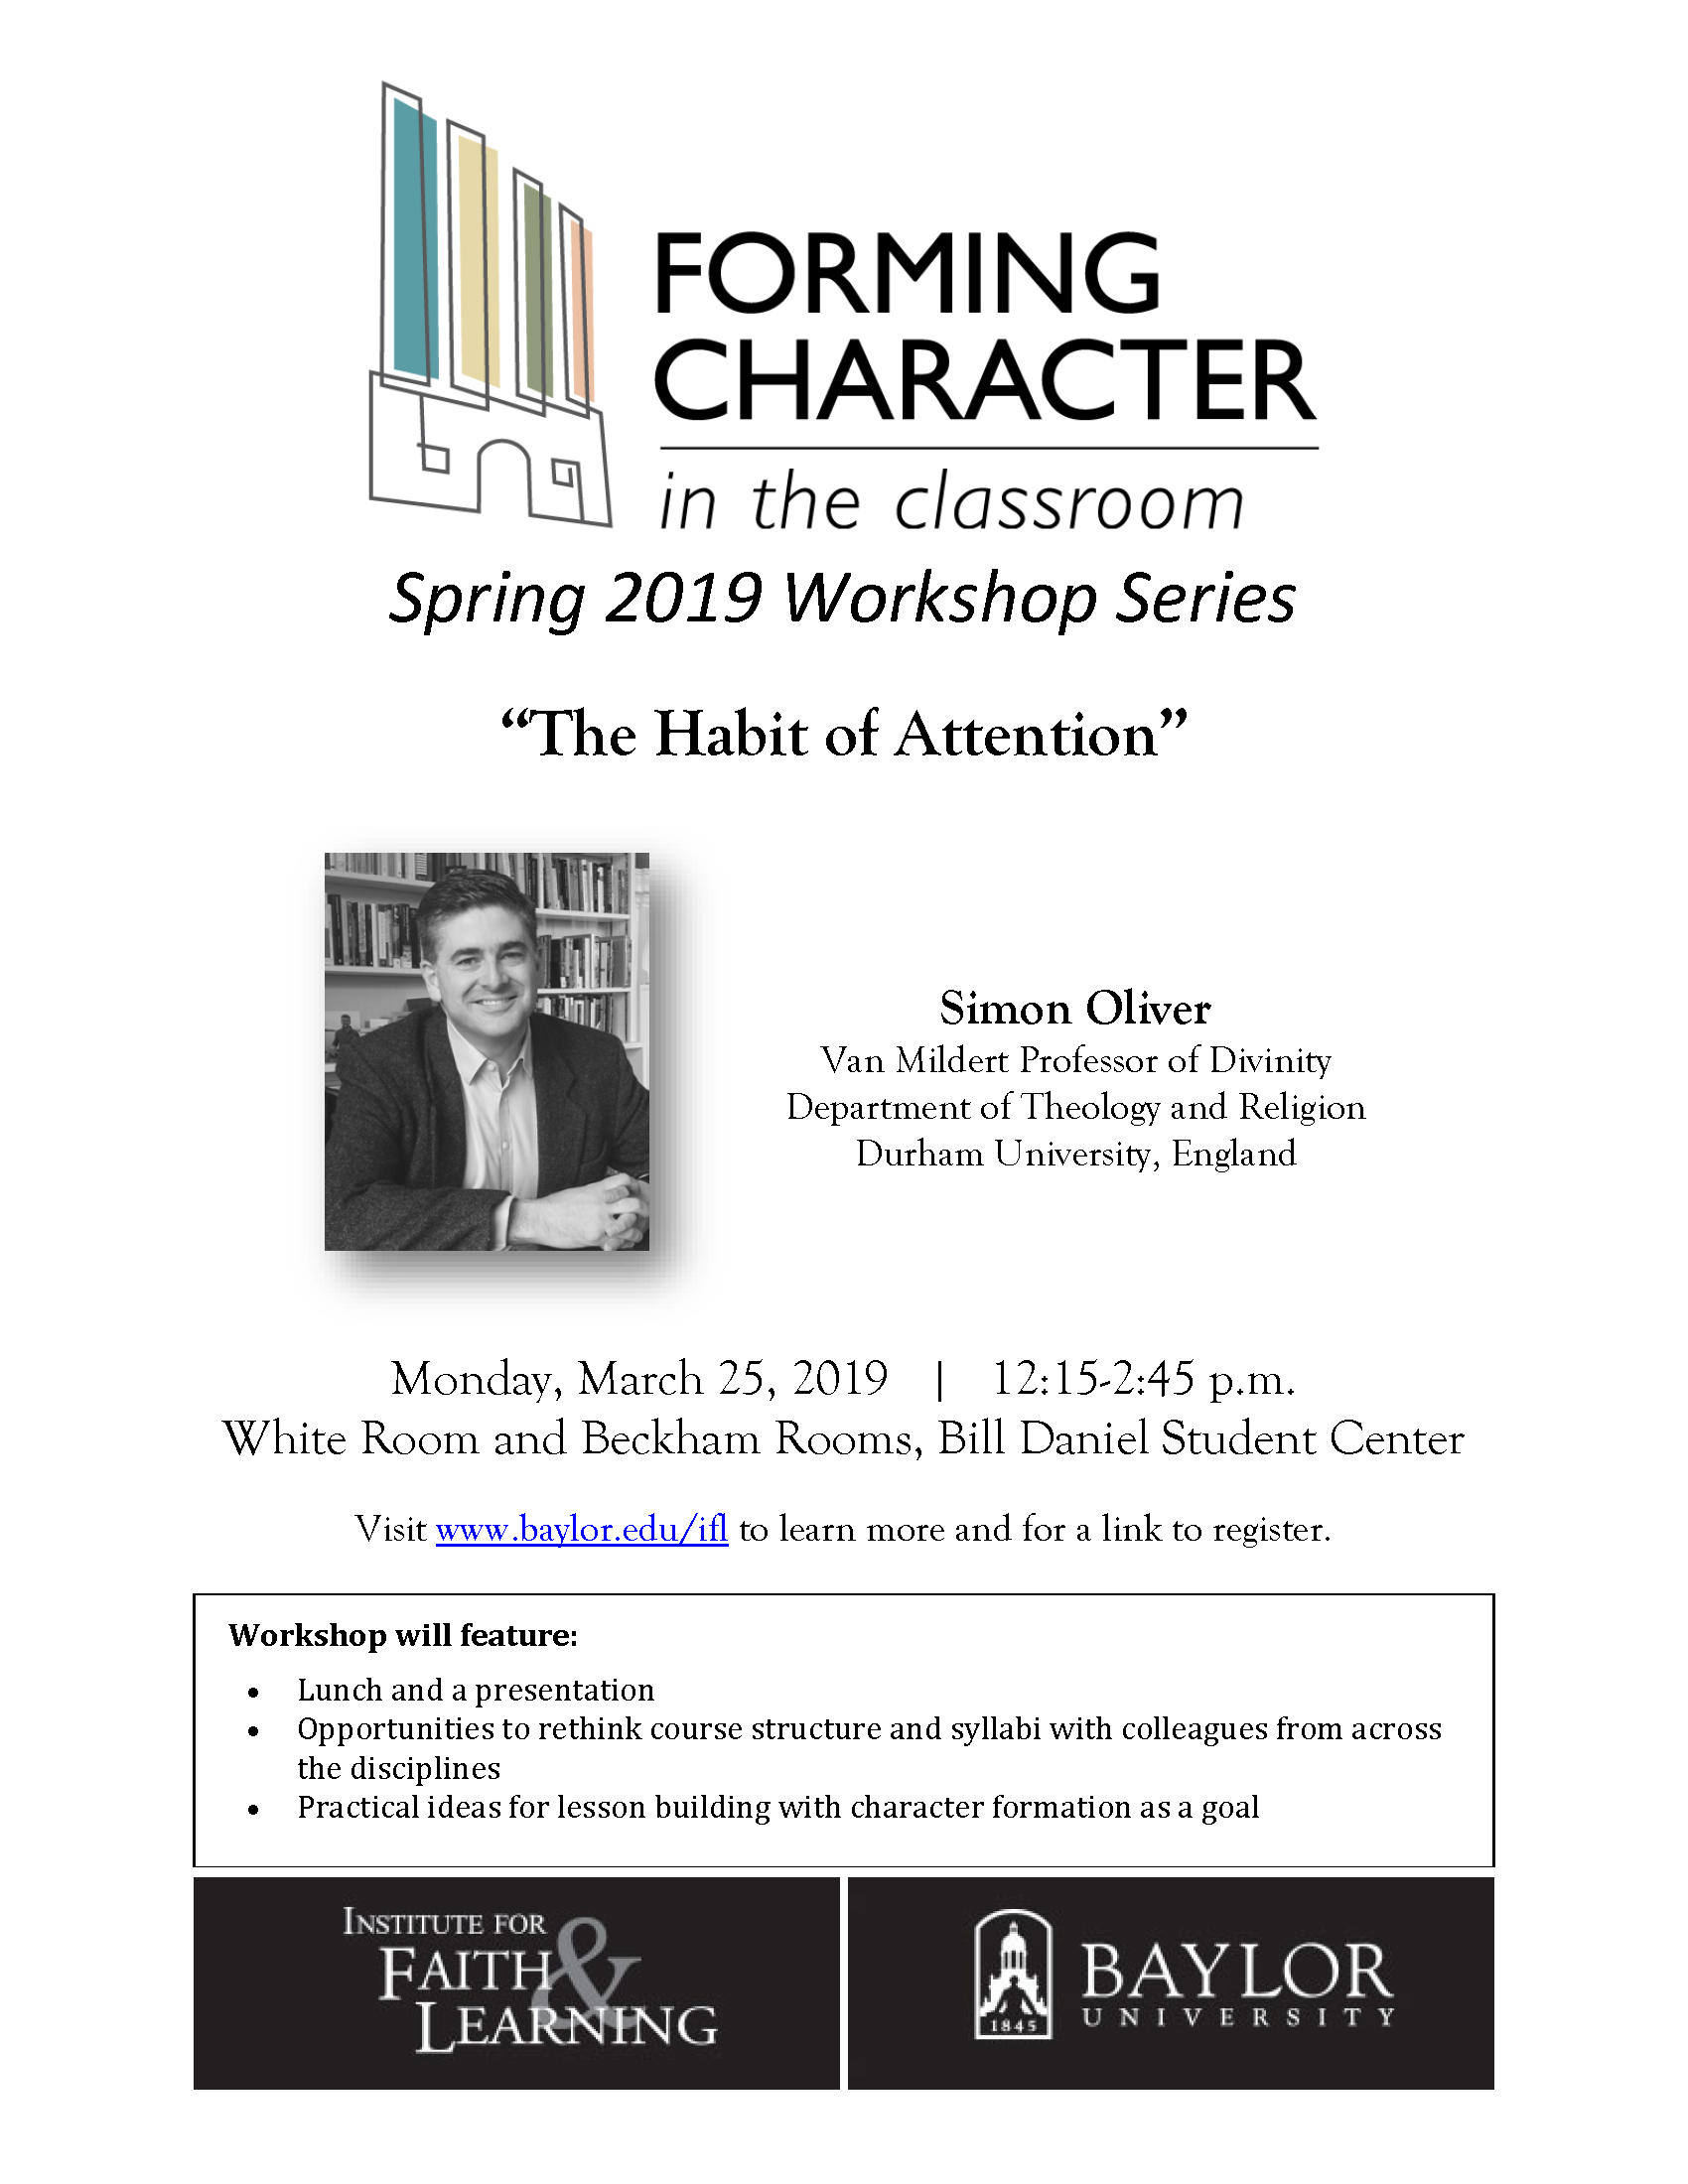 Flyer-IFL Character in Classroom 2019-03-25